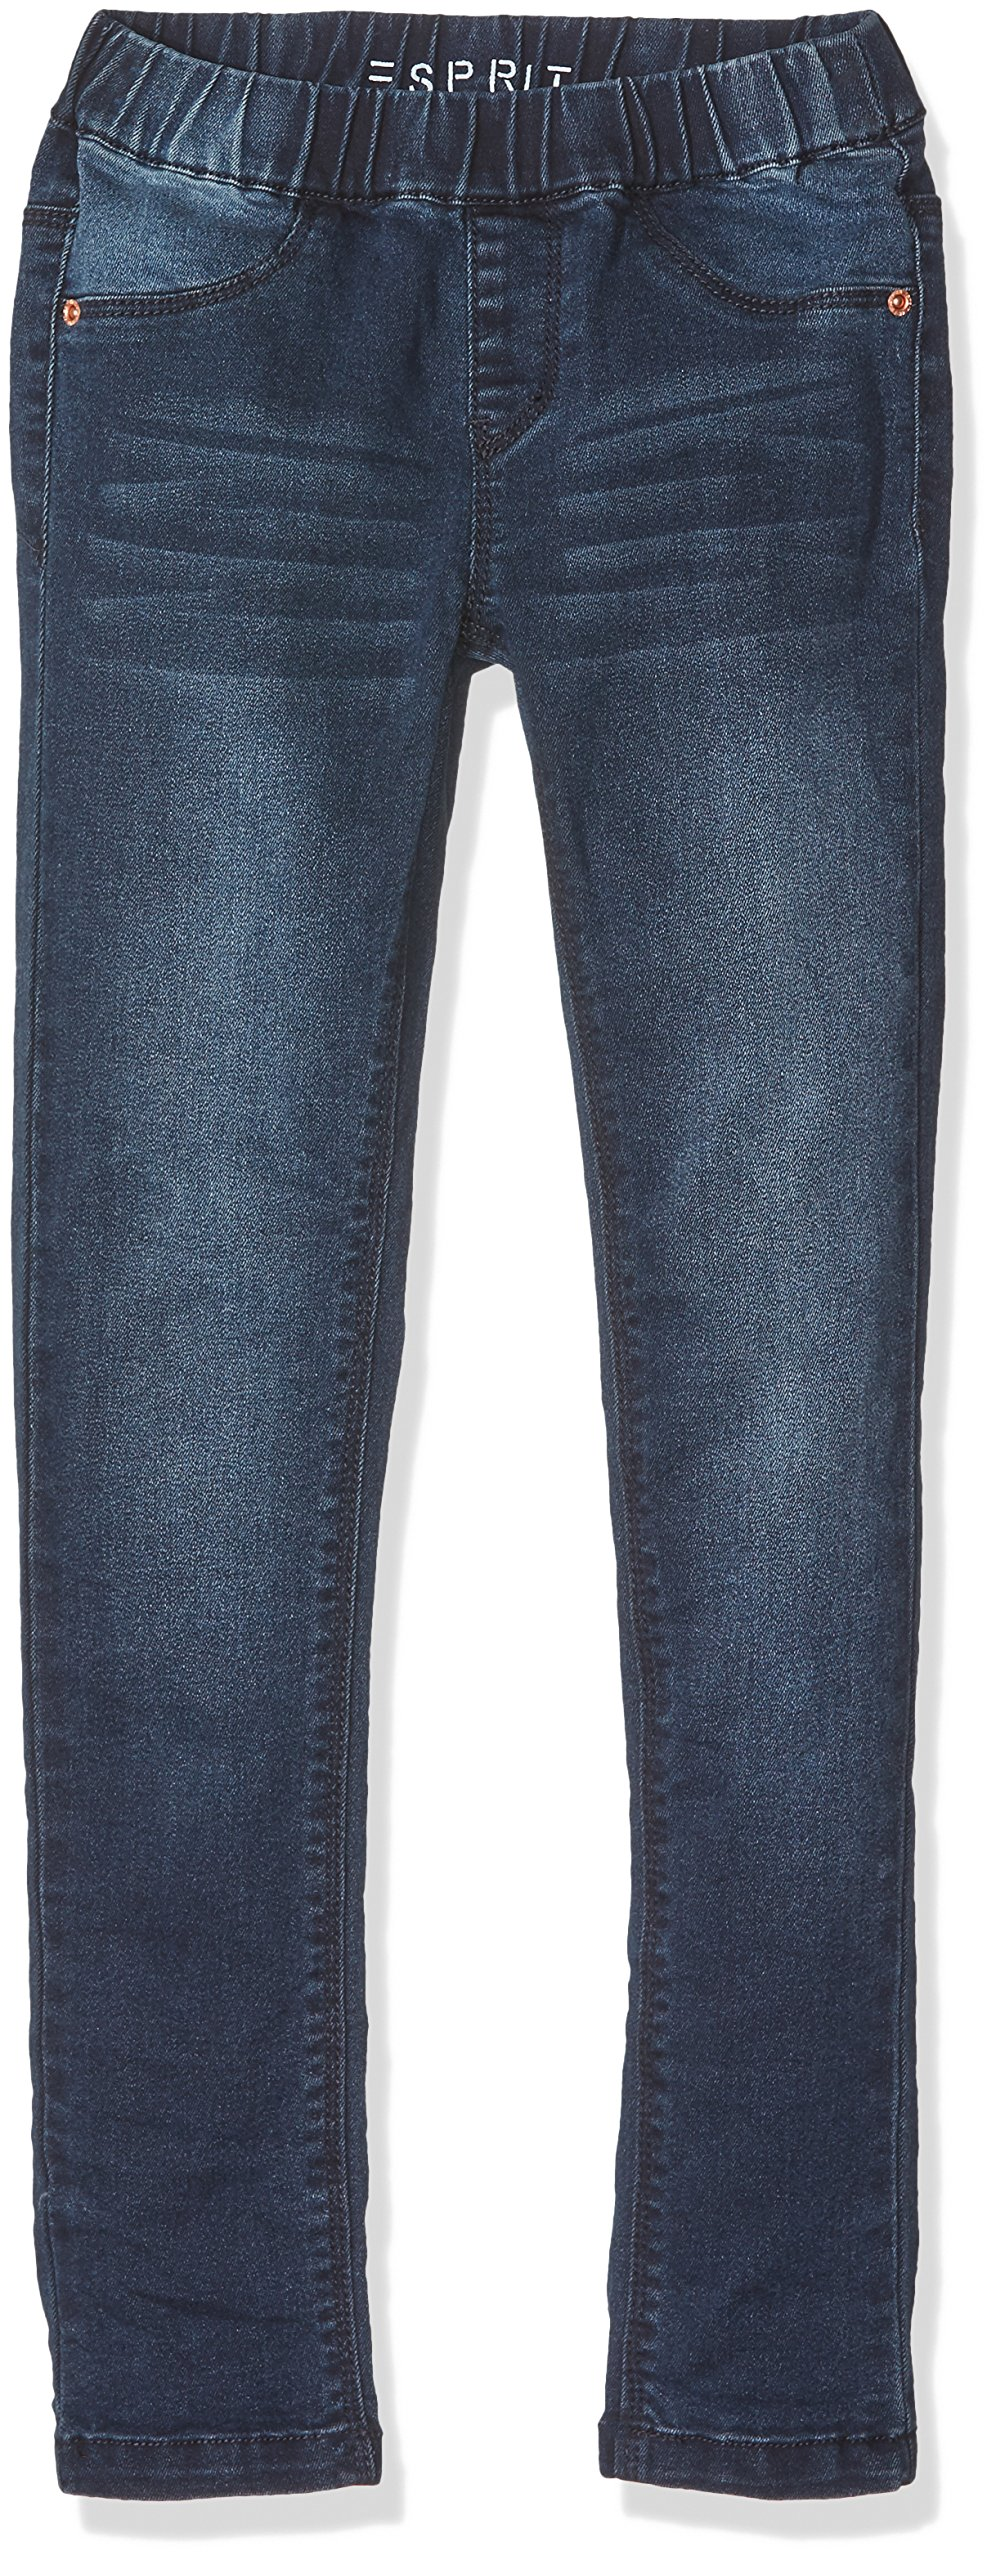 Esprit Kids Hose Pantalones para Niñas